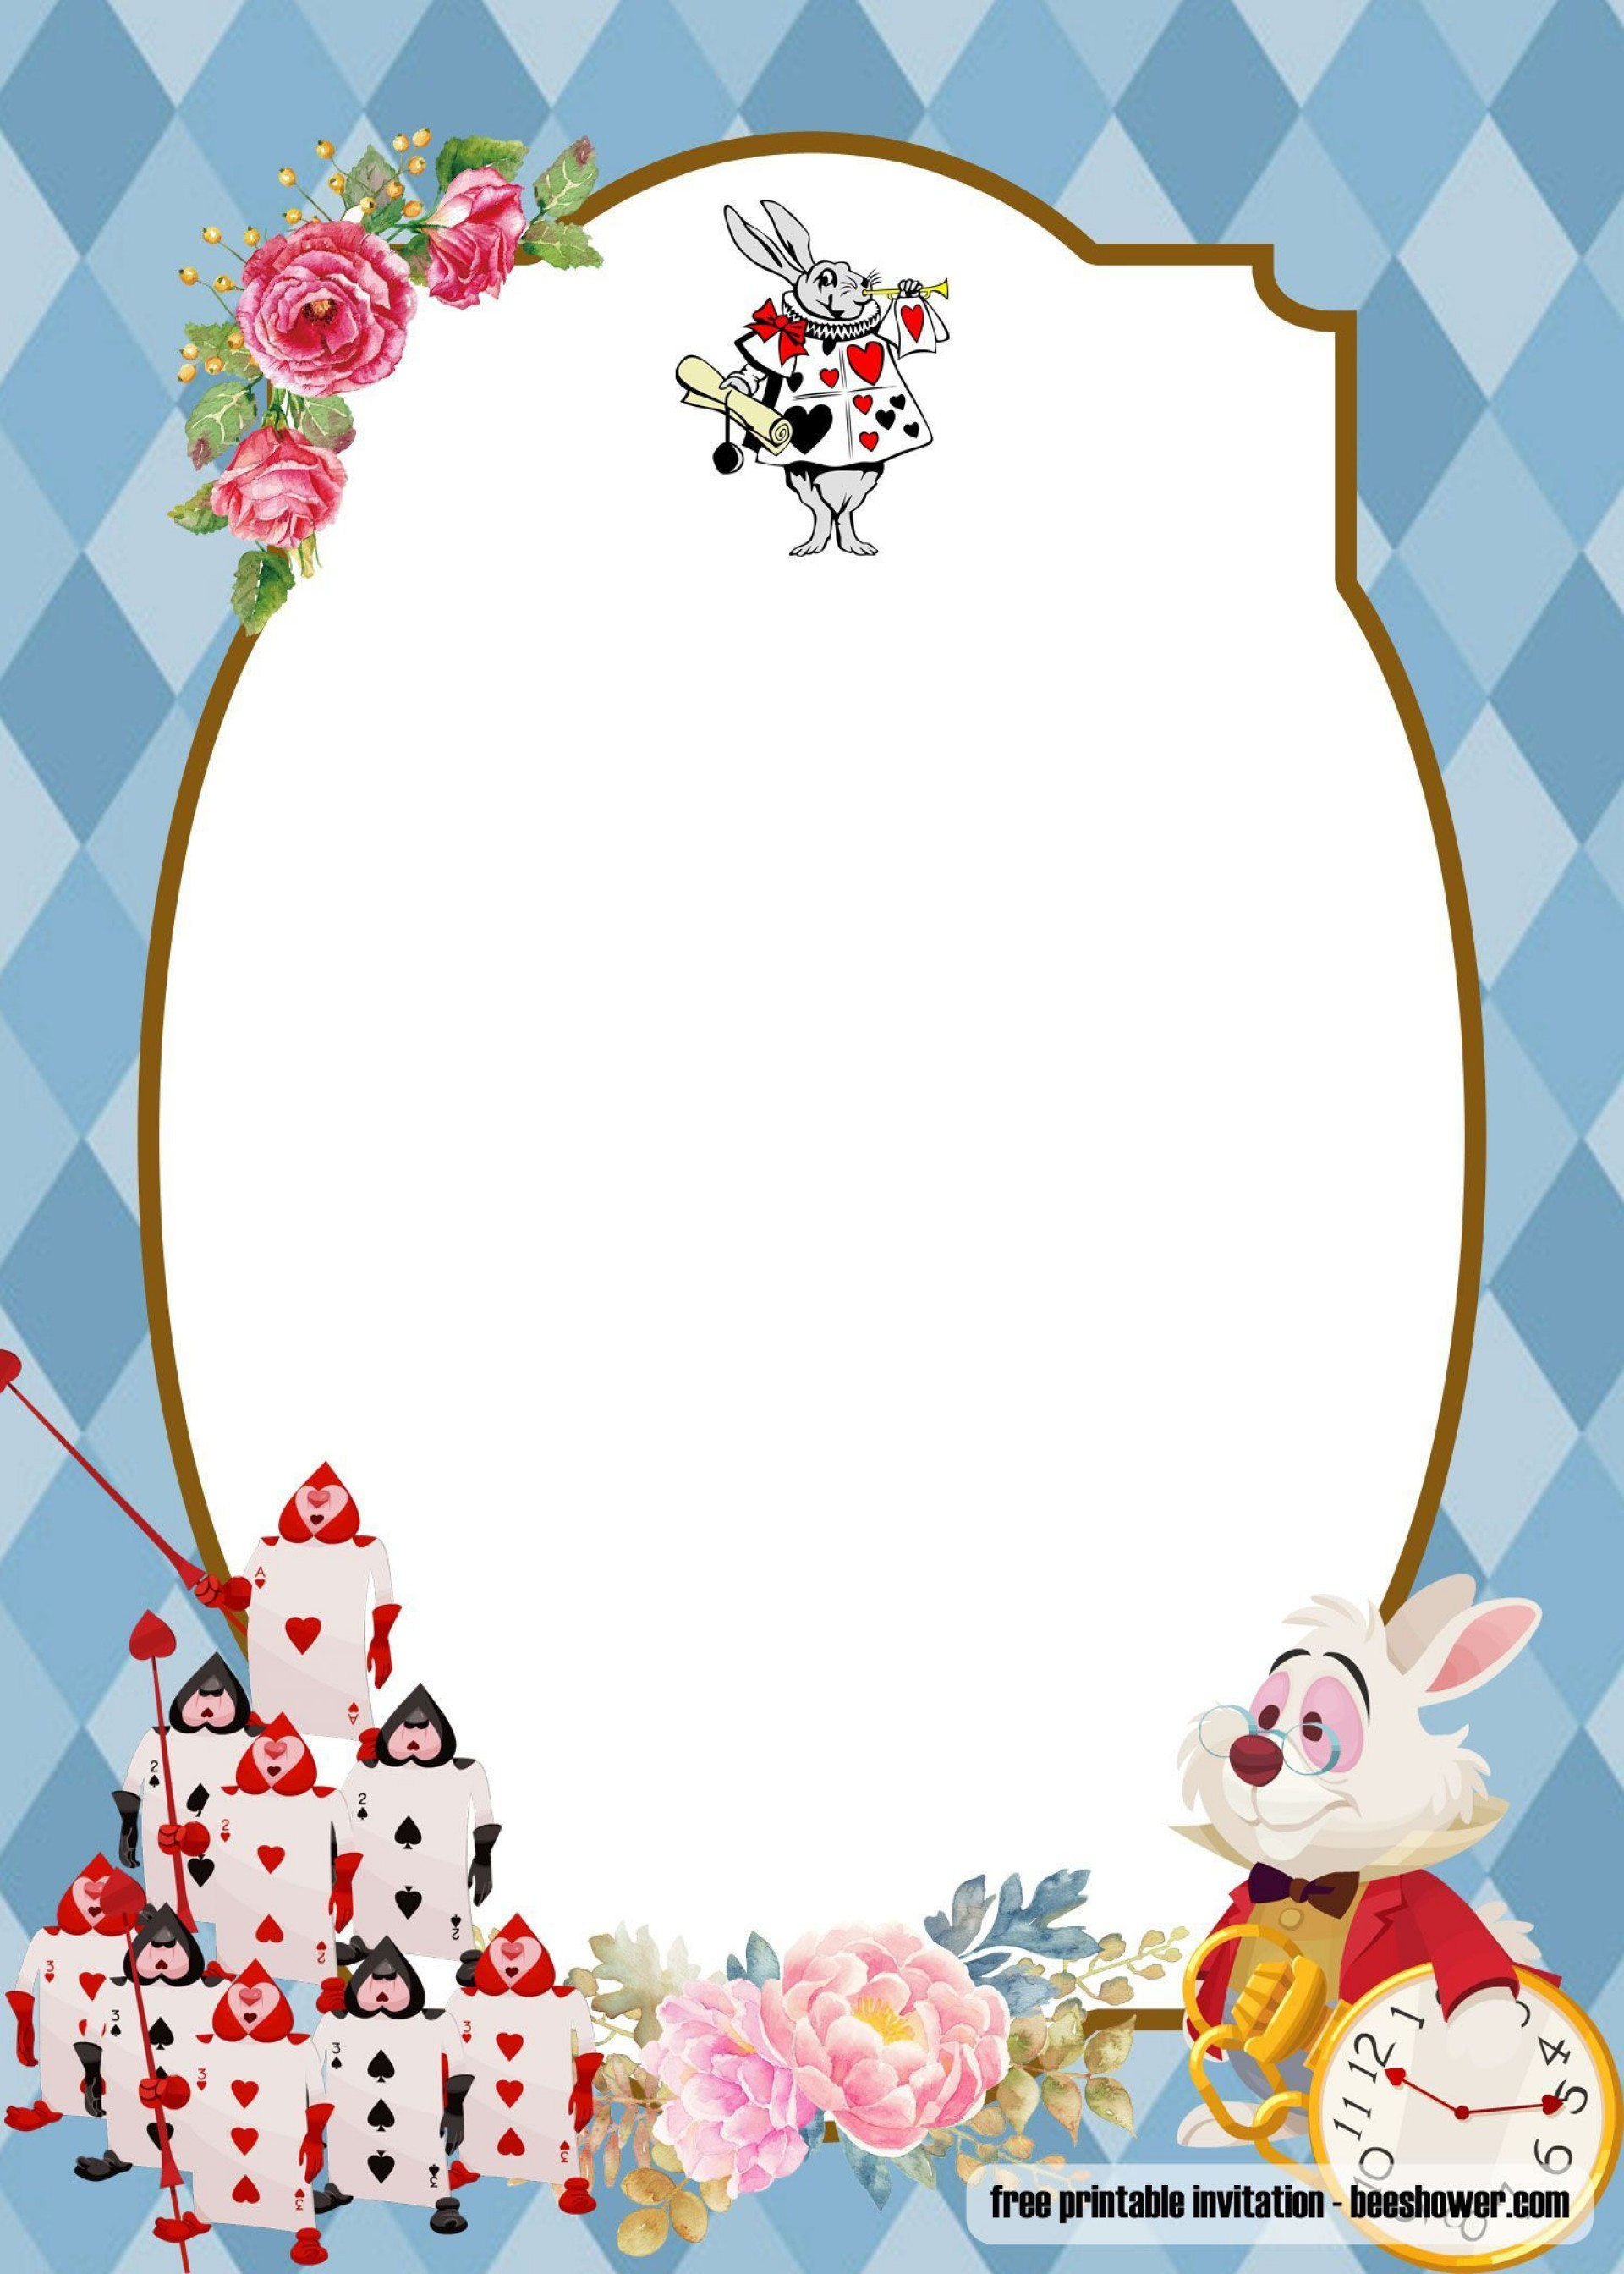 005 Formidable Alice In Wonderland Invitation Template High Resolution  Templates Wedding Birthday Free Tea Party1920